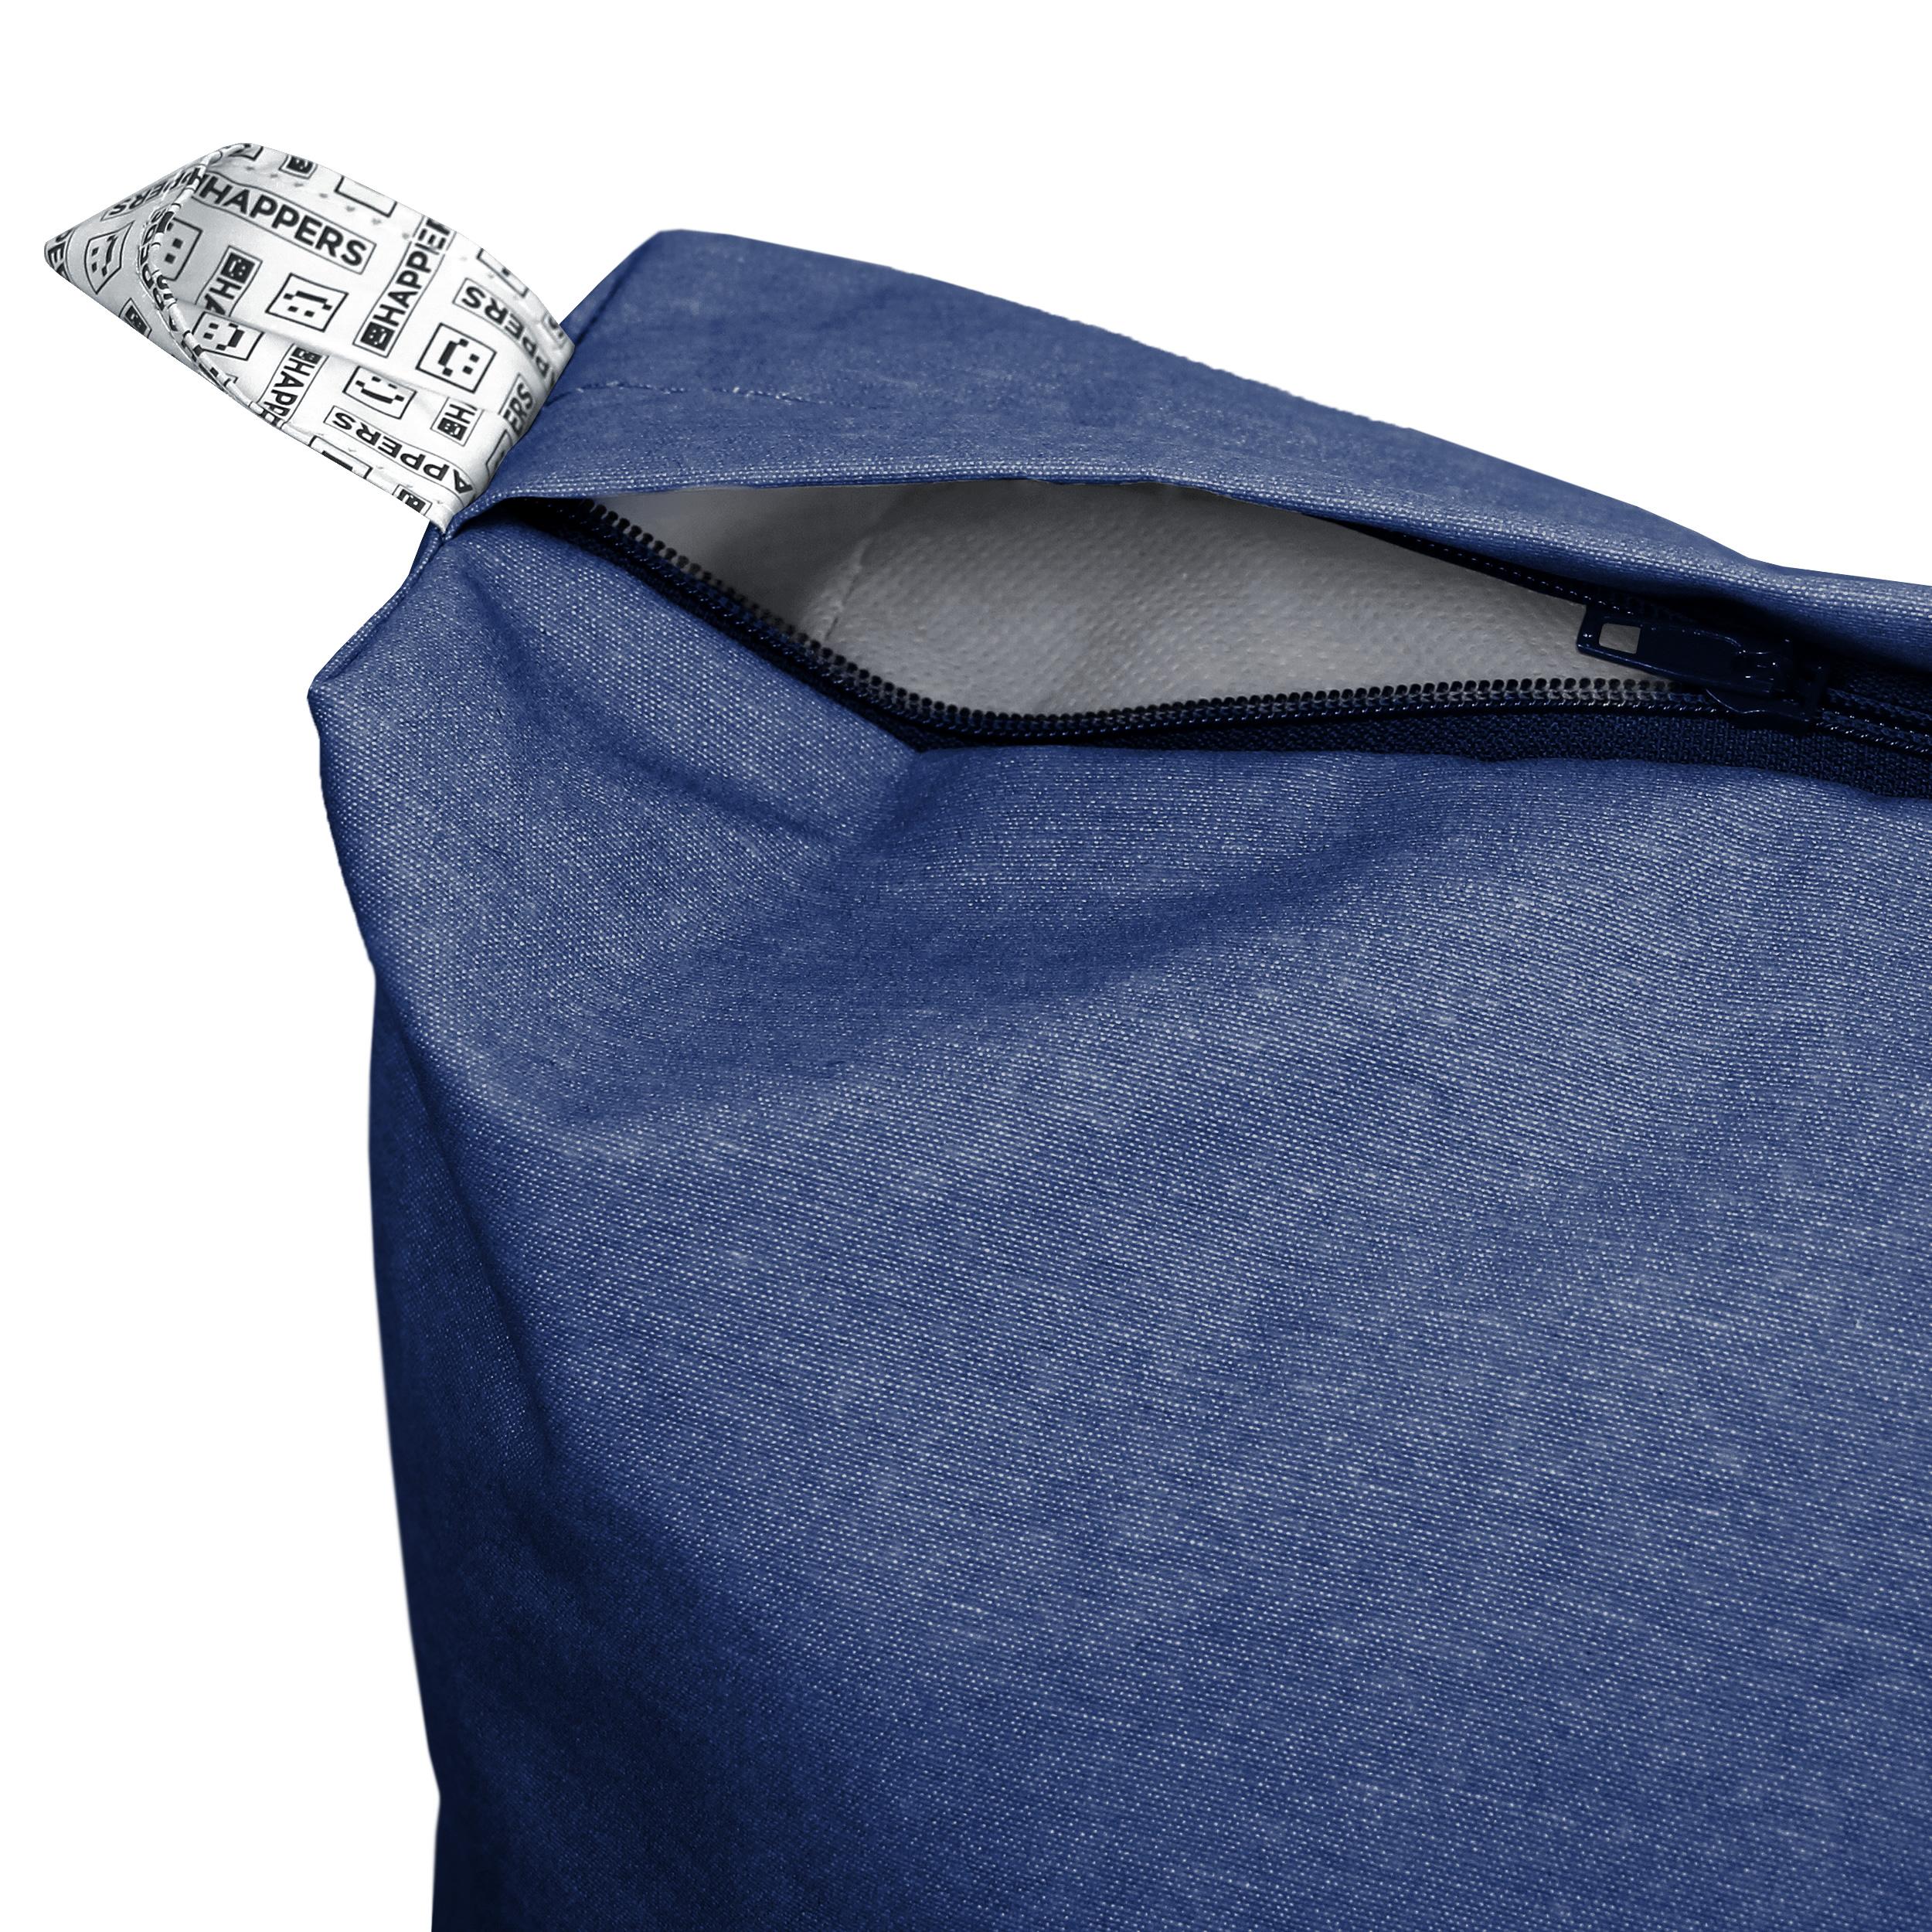 Set de Cojines Impermeables y Desenfundables para Palet en Naylim Mate Azul (3)